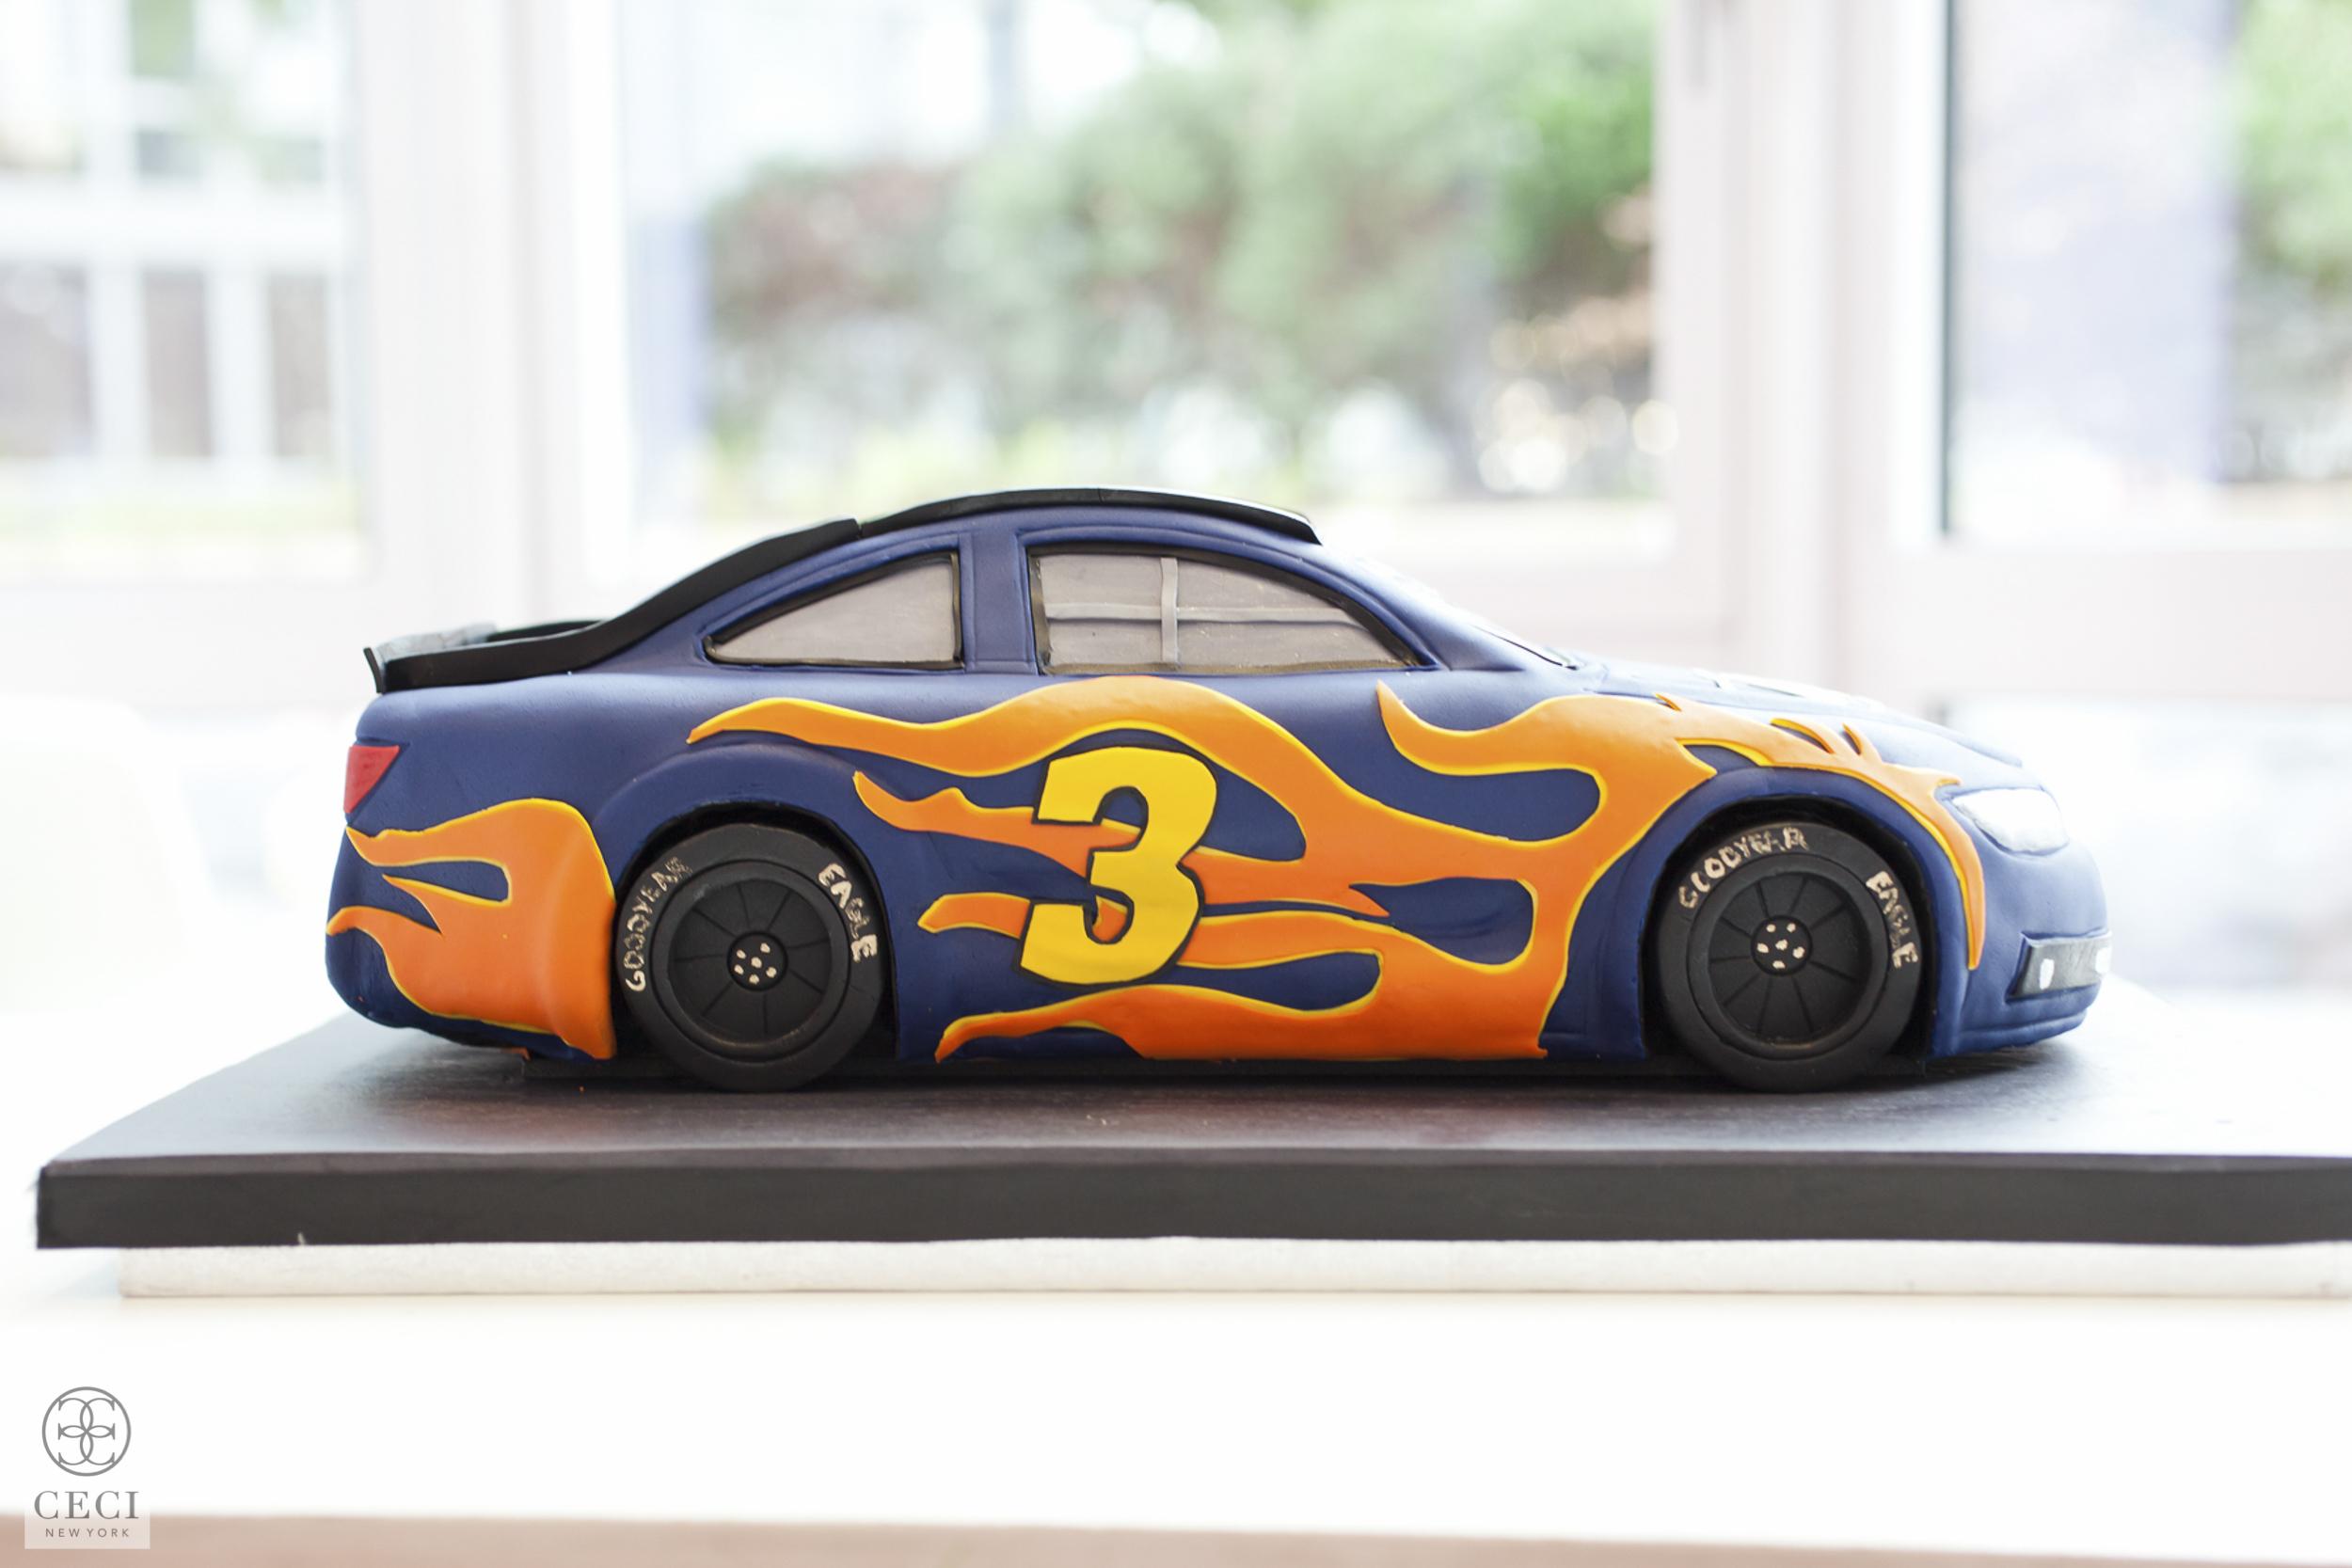 ceci_new_york_mason_ceci_johnson_race_car_birthday_party-3.jpg